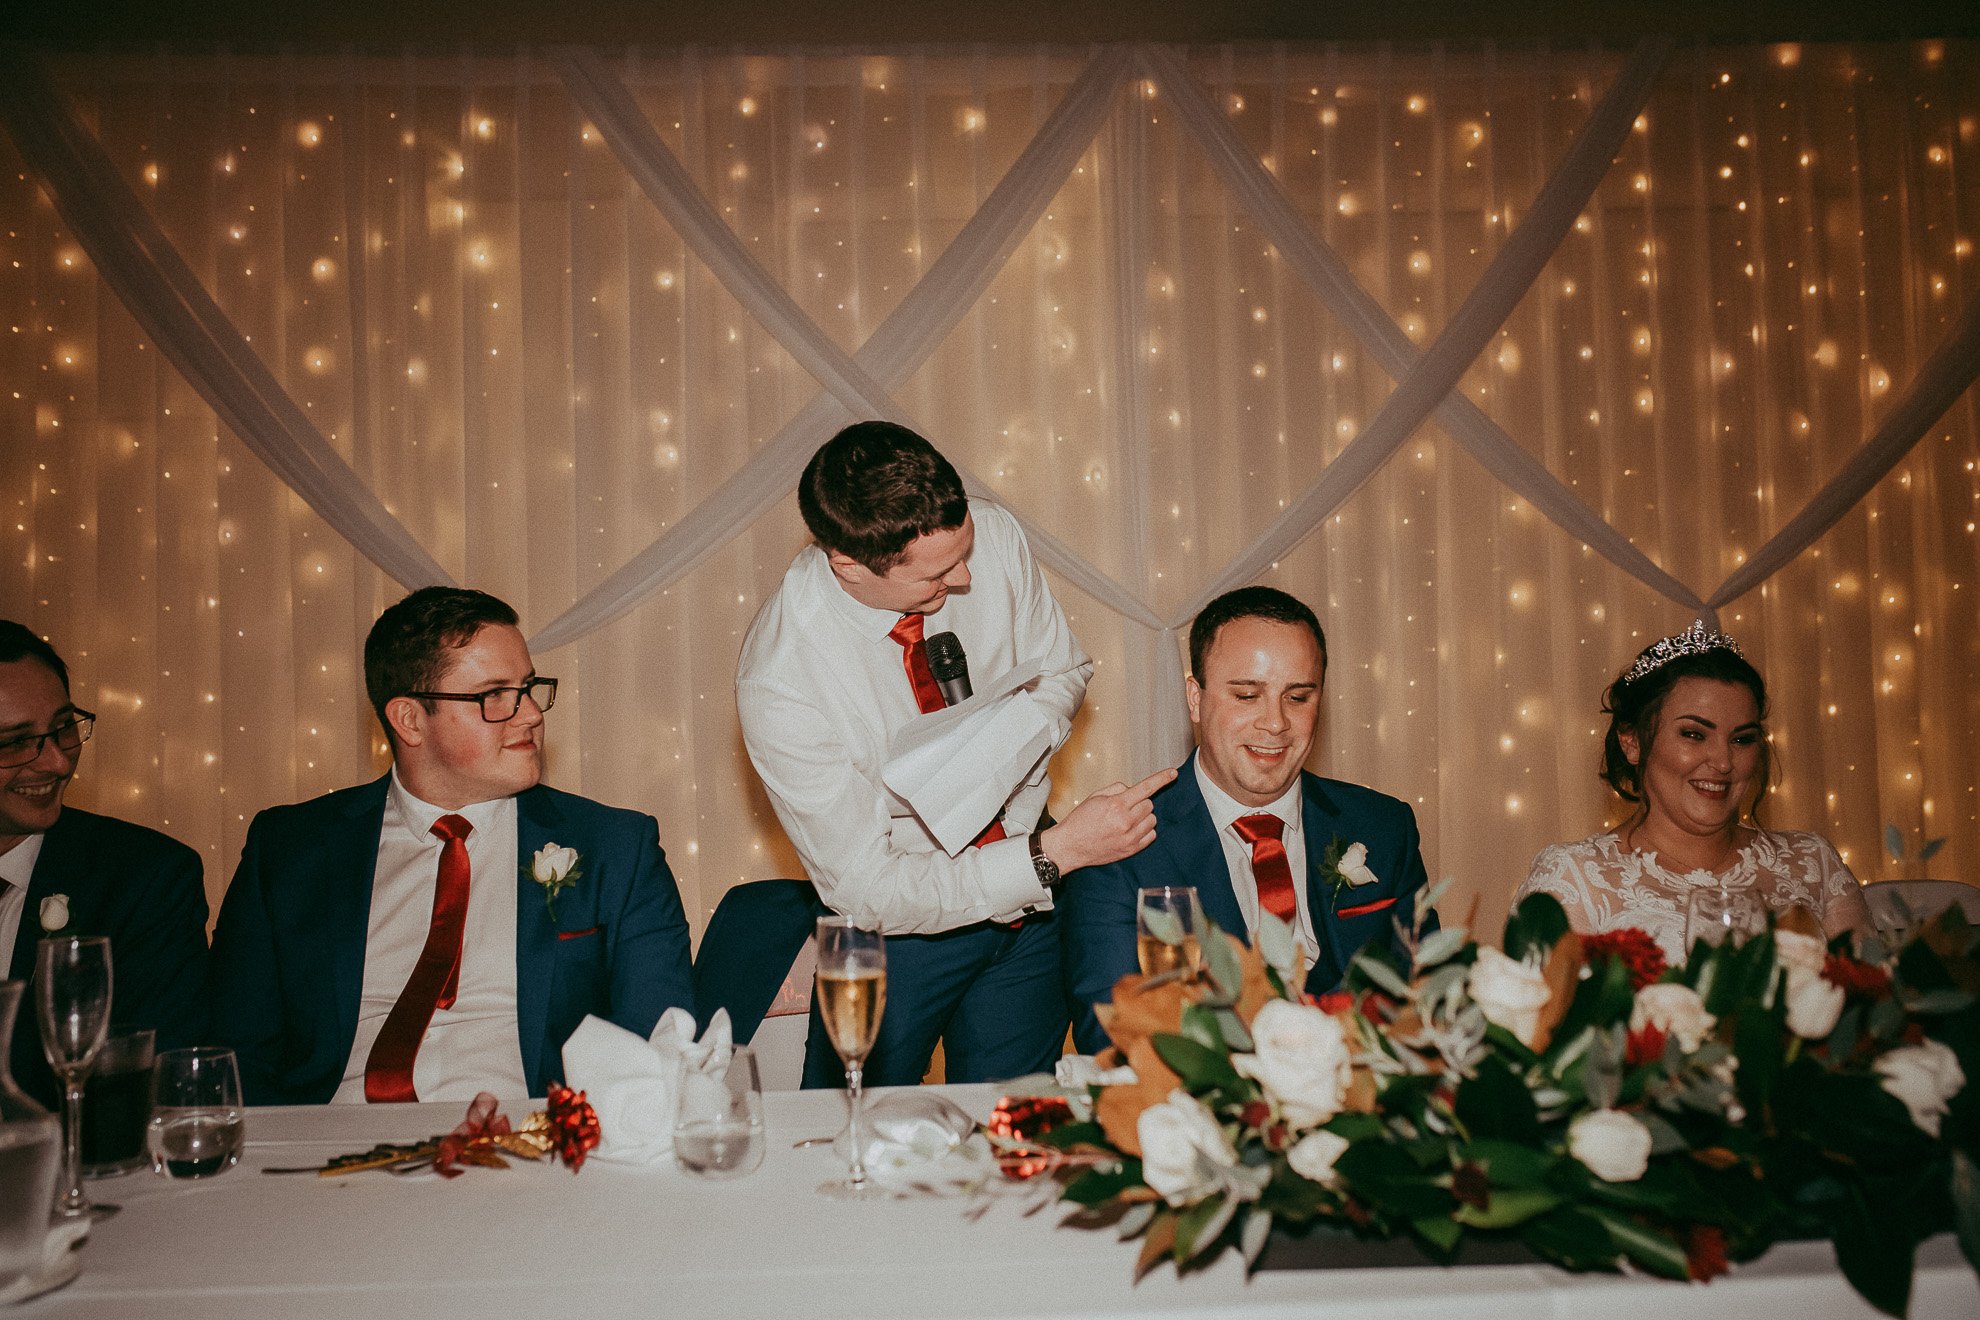 wedding-by-levien-777.jpg